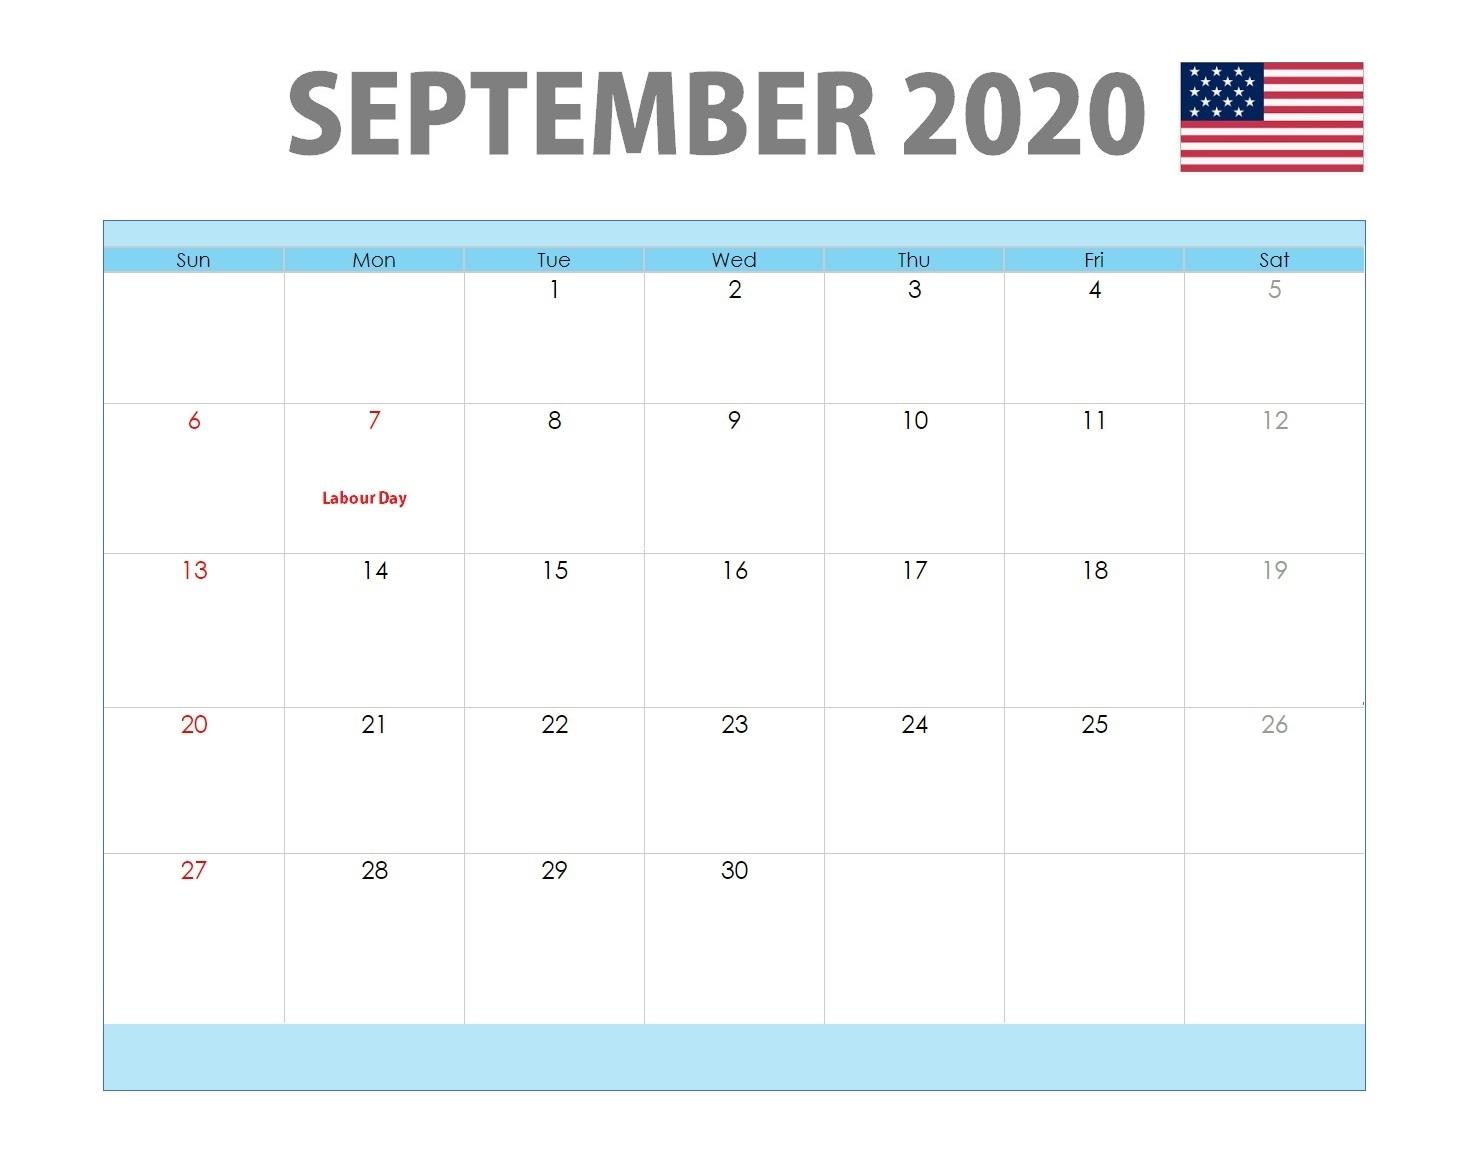 September 2020 USA Holidays